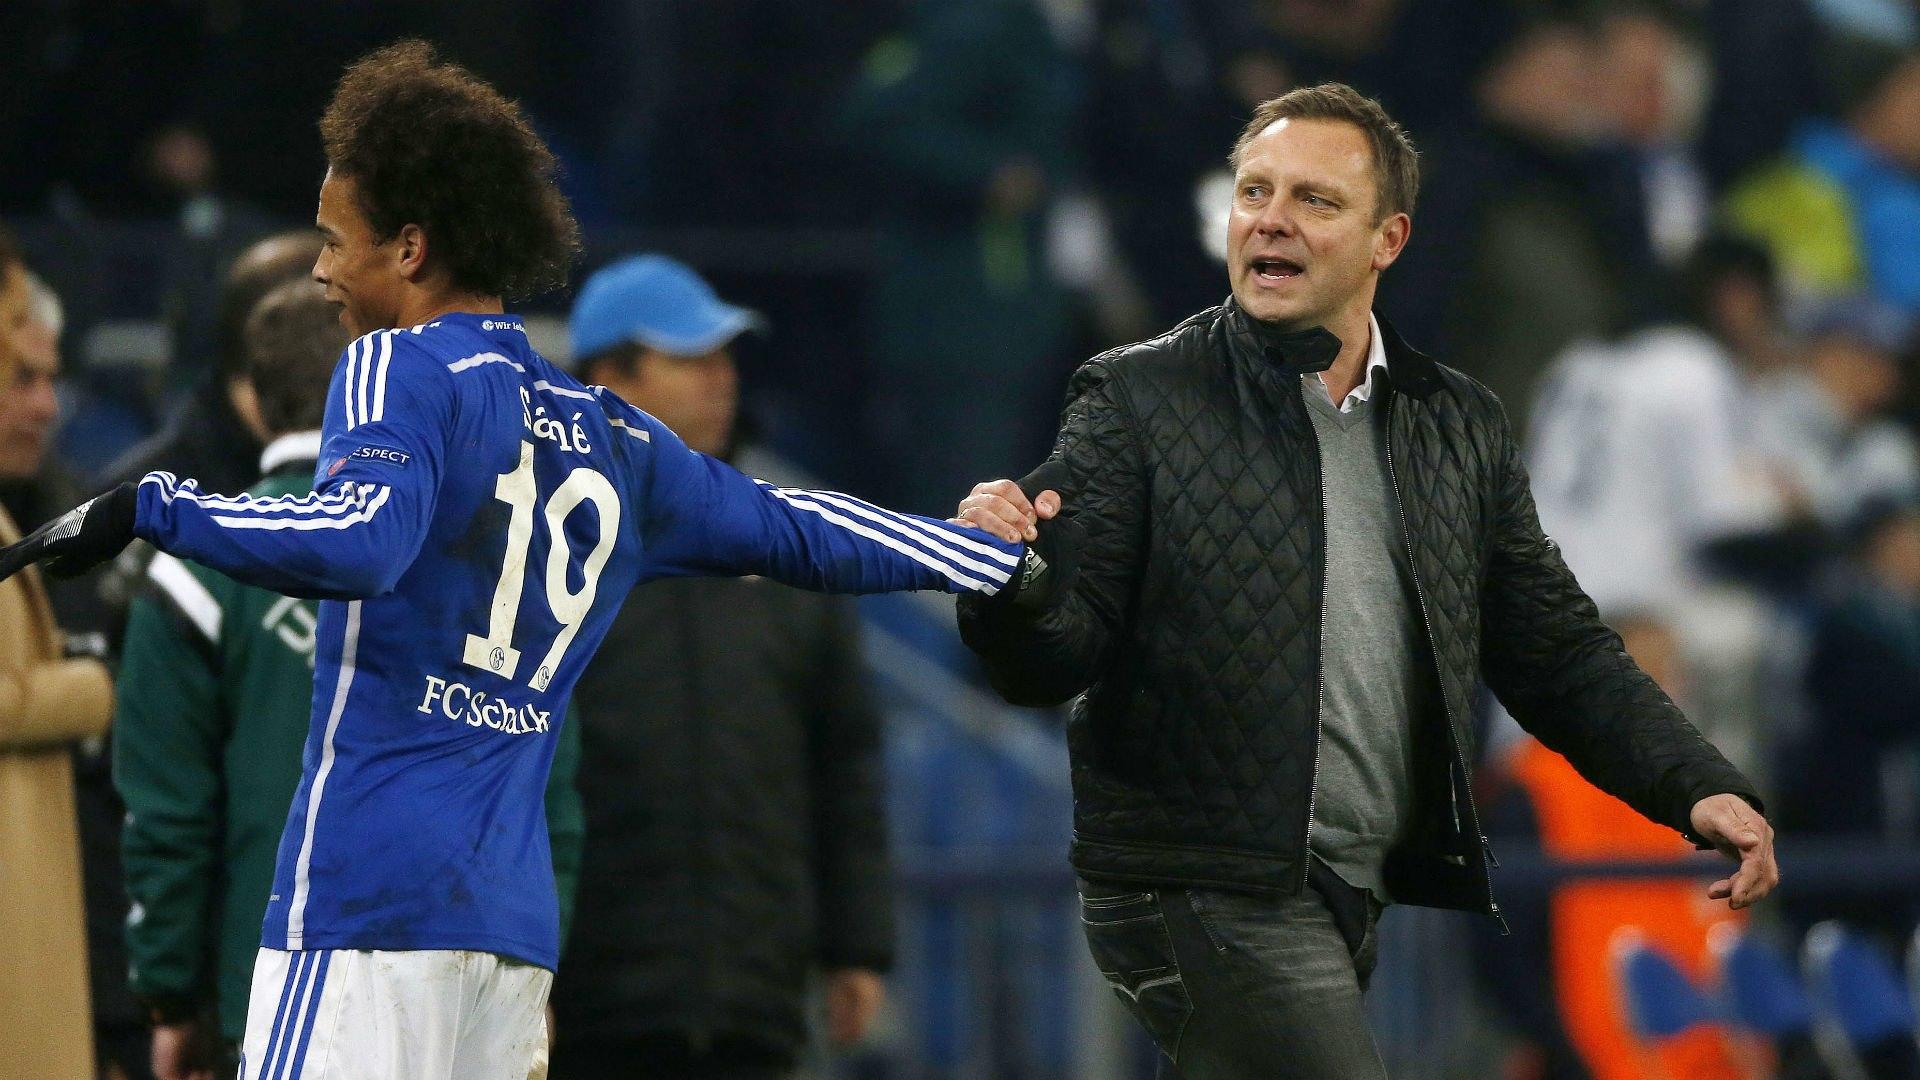 Andre Breitenreiter Schalke: Andre Breitenreiter on Leroy Sane ...